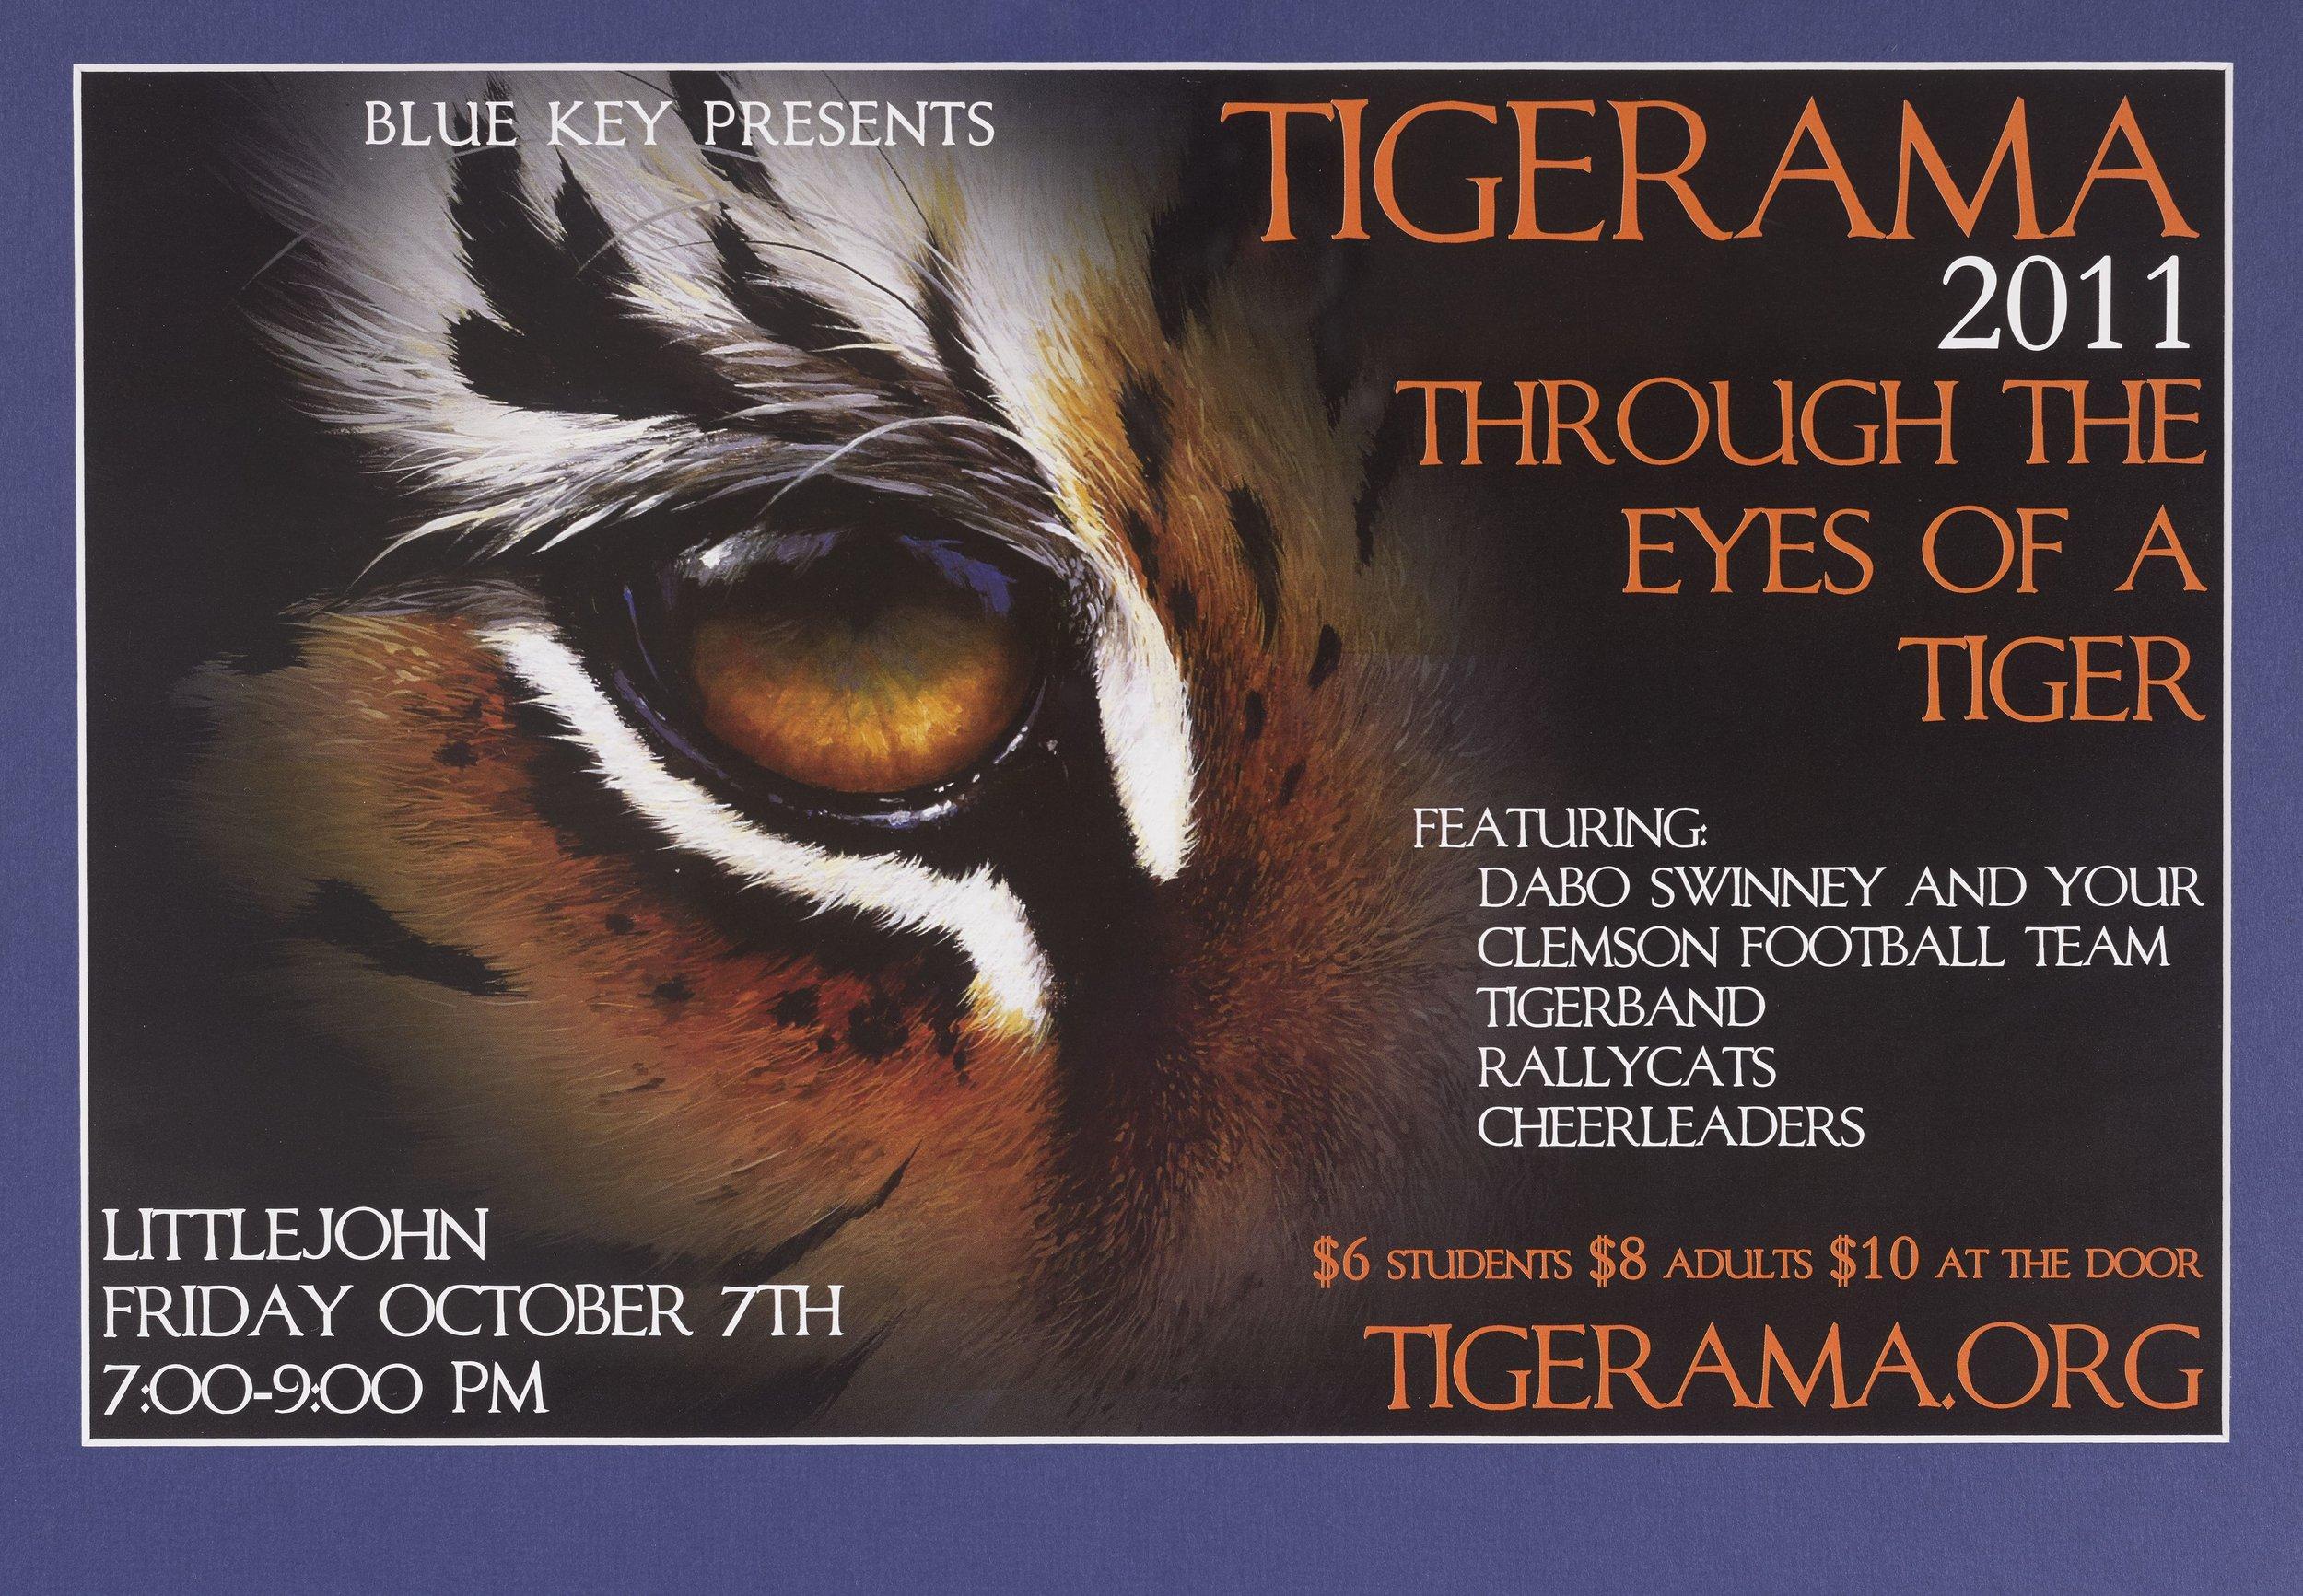 Tigerama 2011